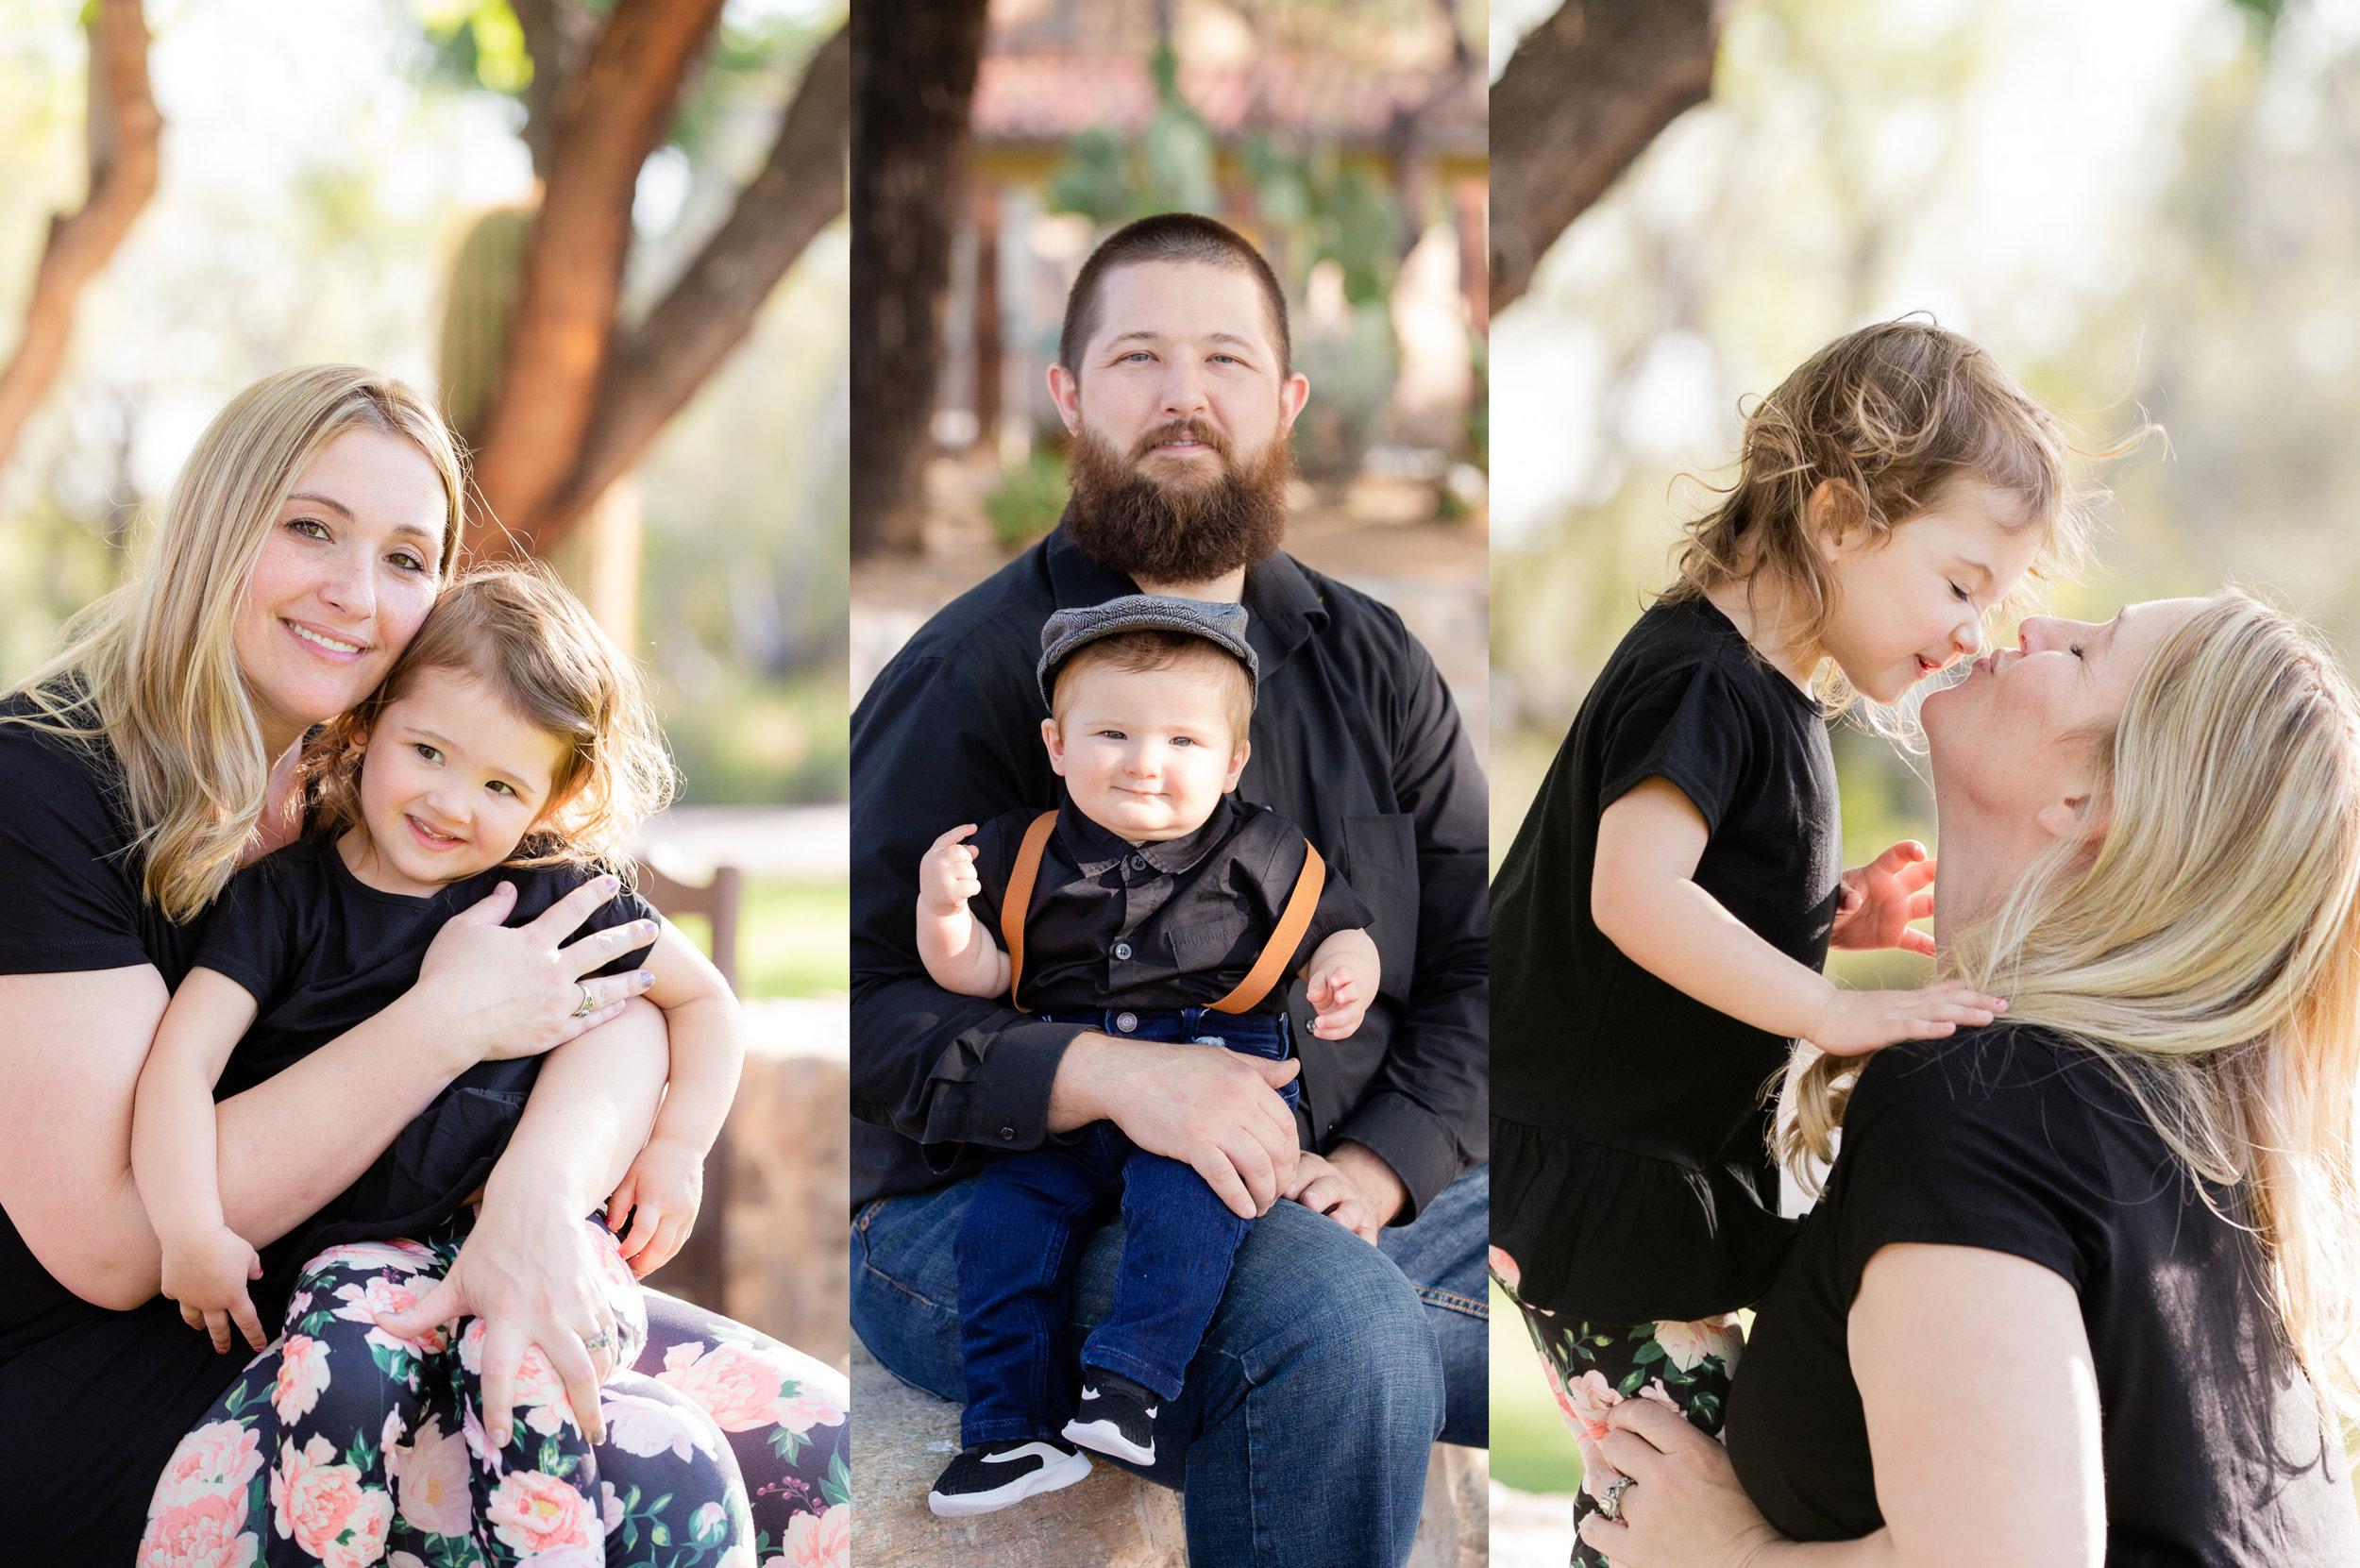 David-Orr-Photography_Family-Portraits.jpg